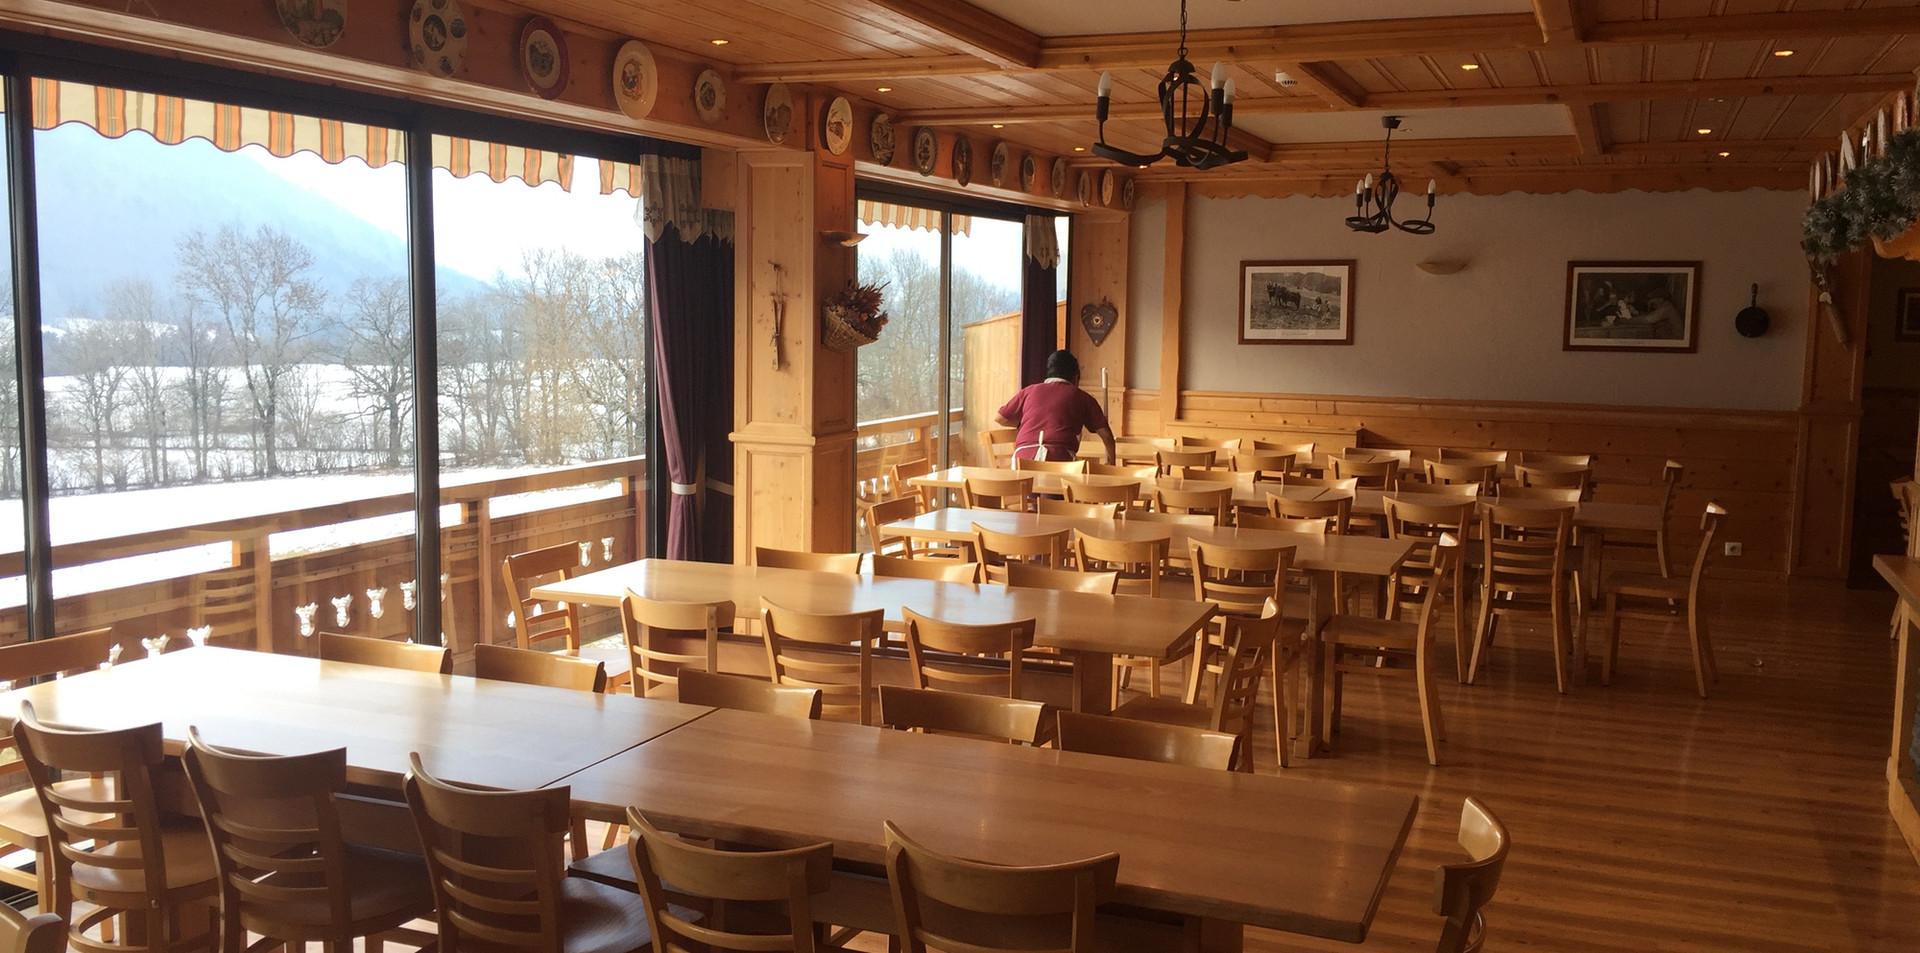 Classes de neige Bernex 23.jpeg